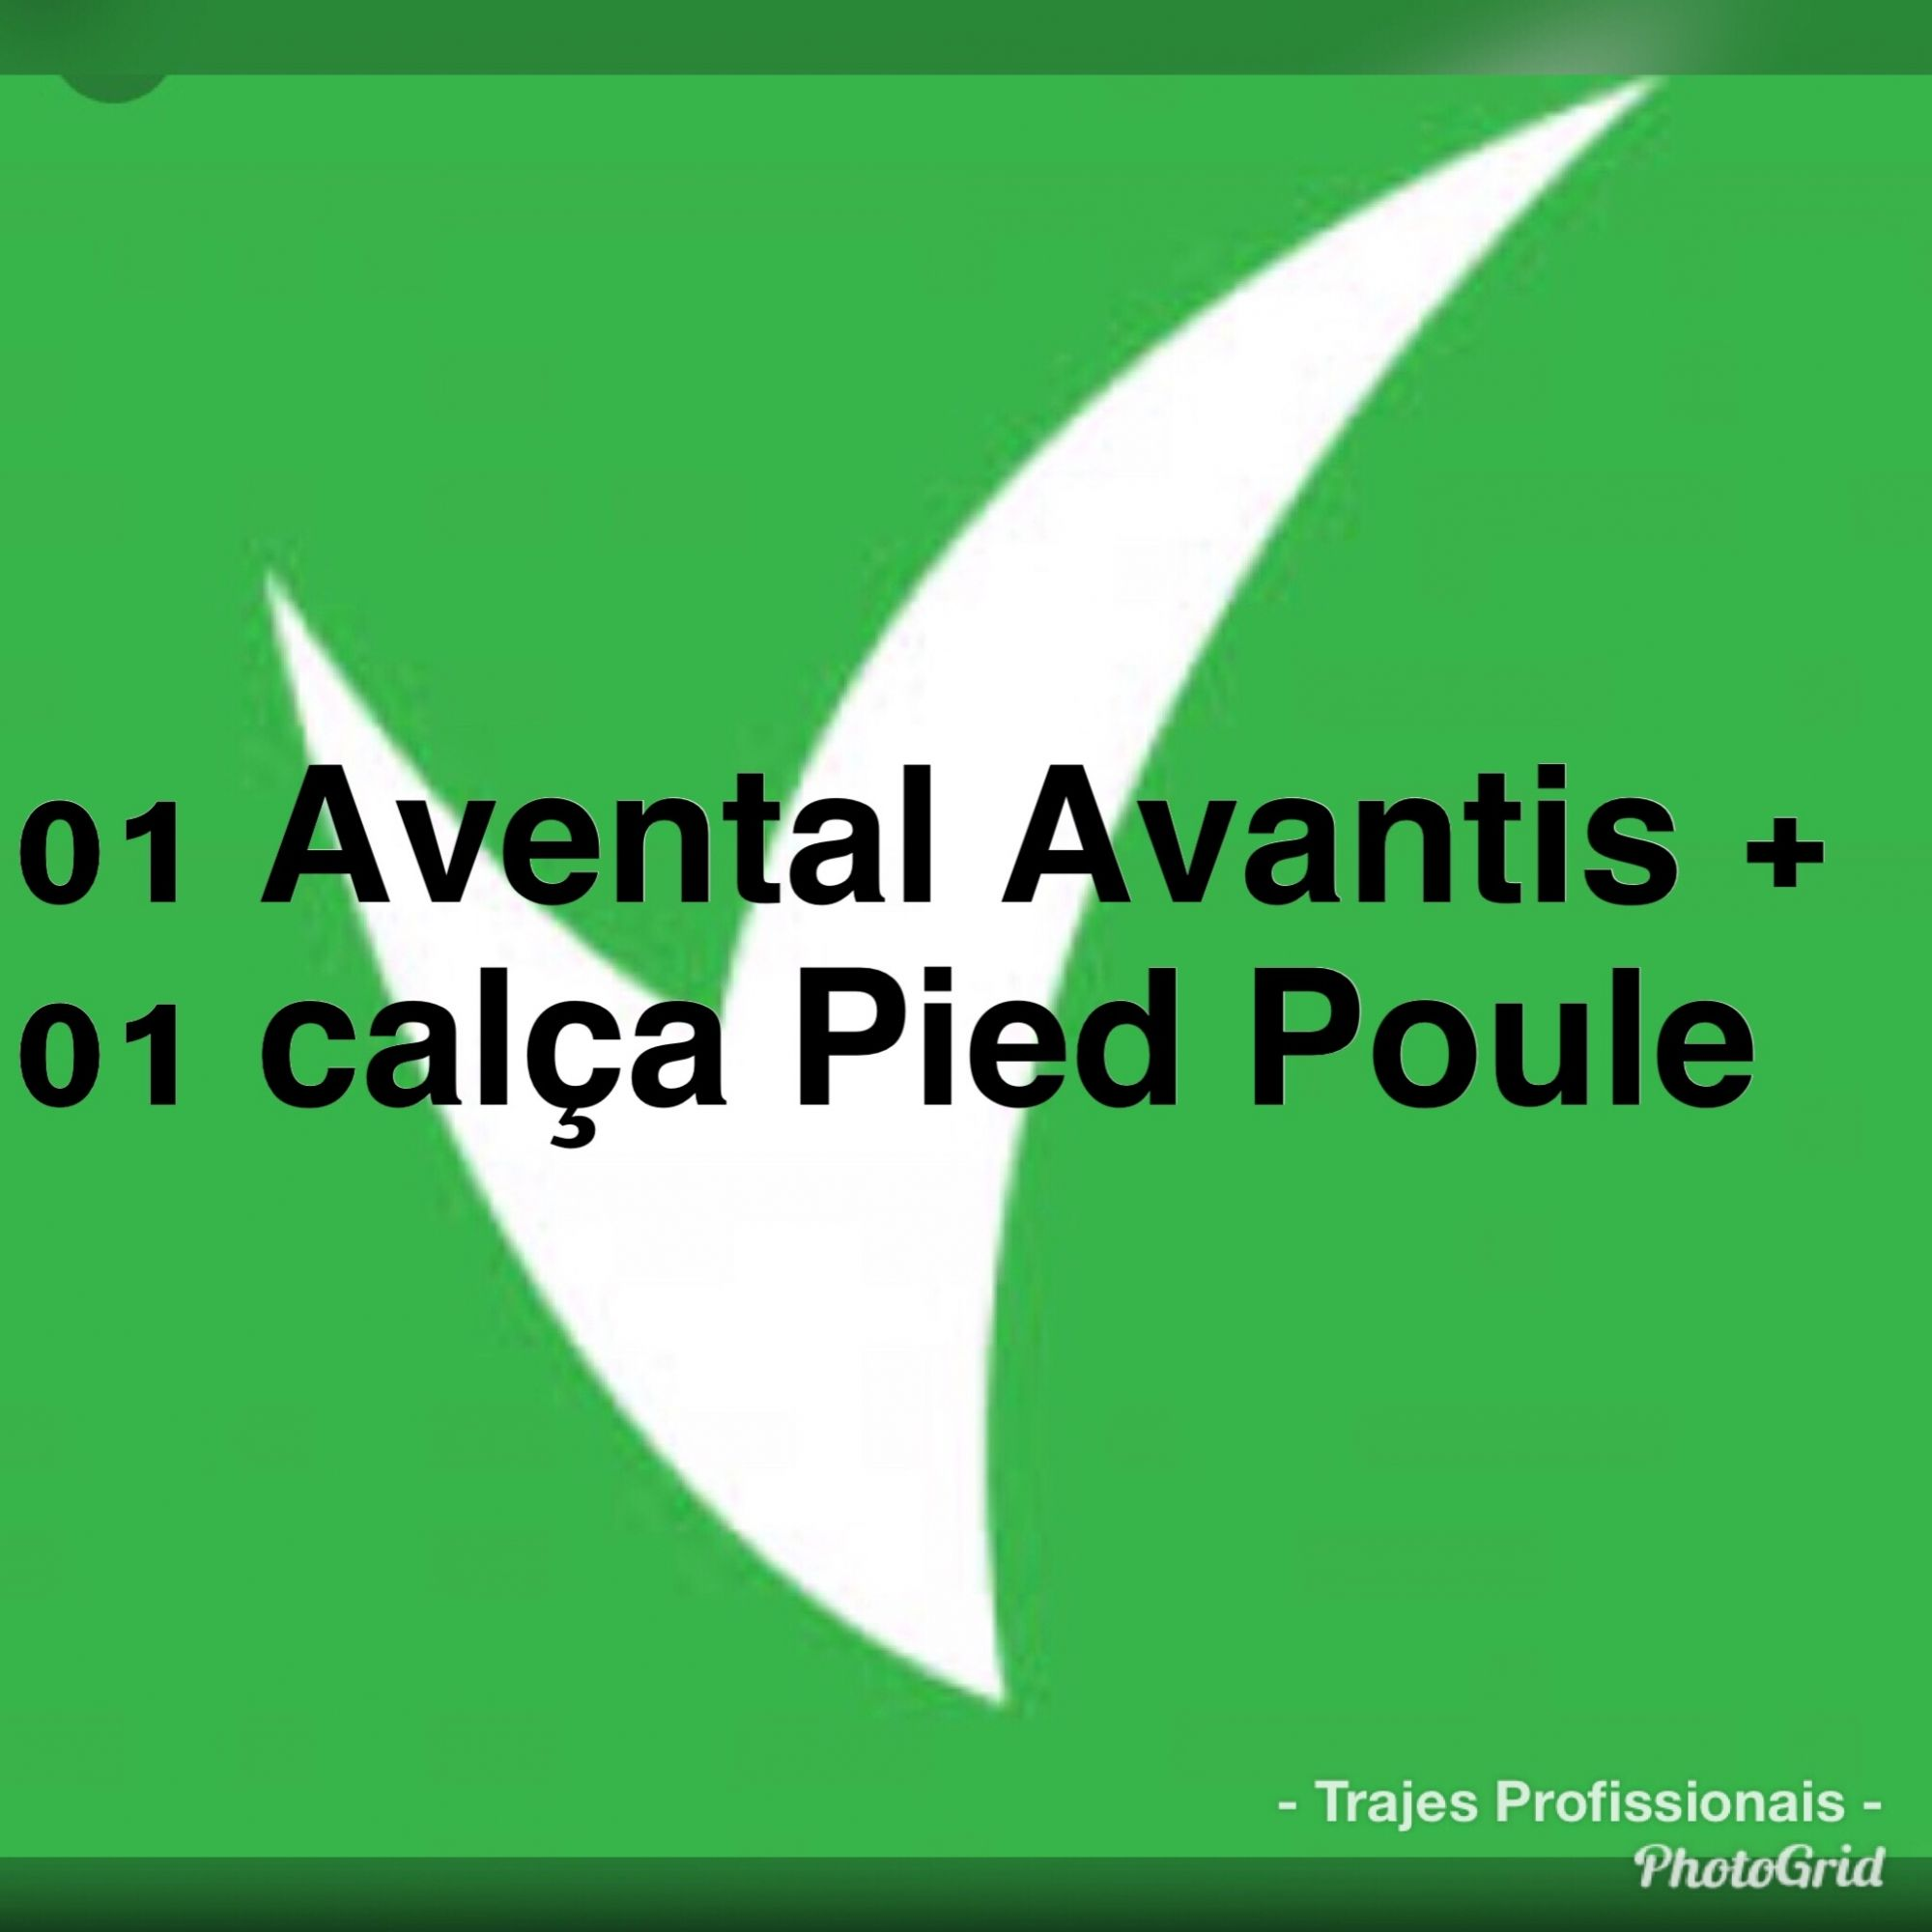 Conjunto: 01 avental bistrô Avantis + 01 calça pied poule